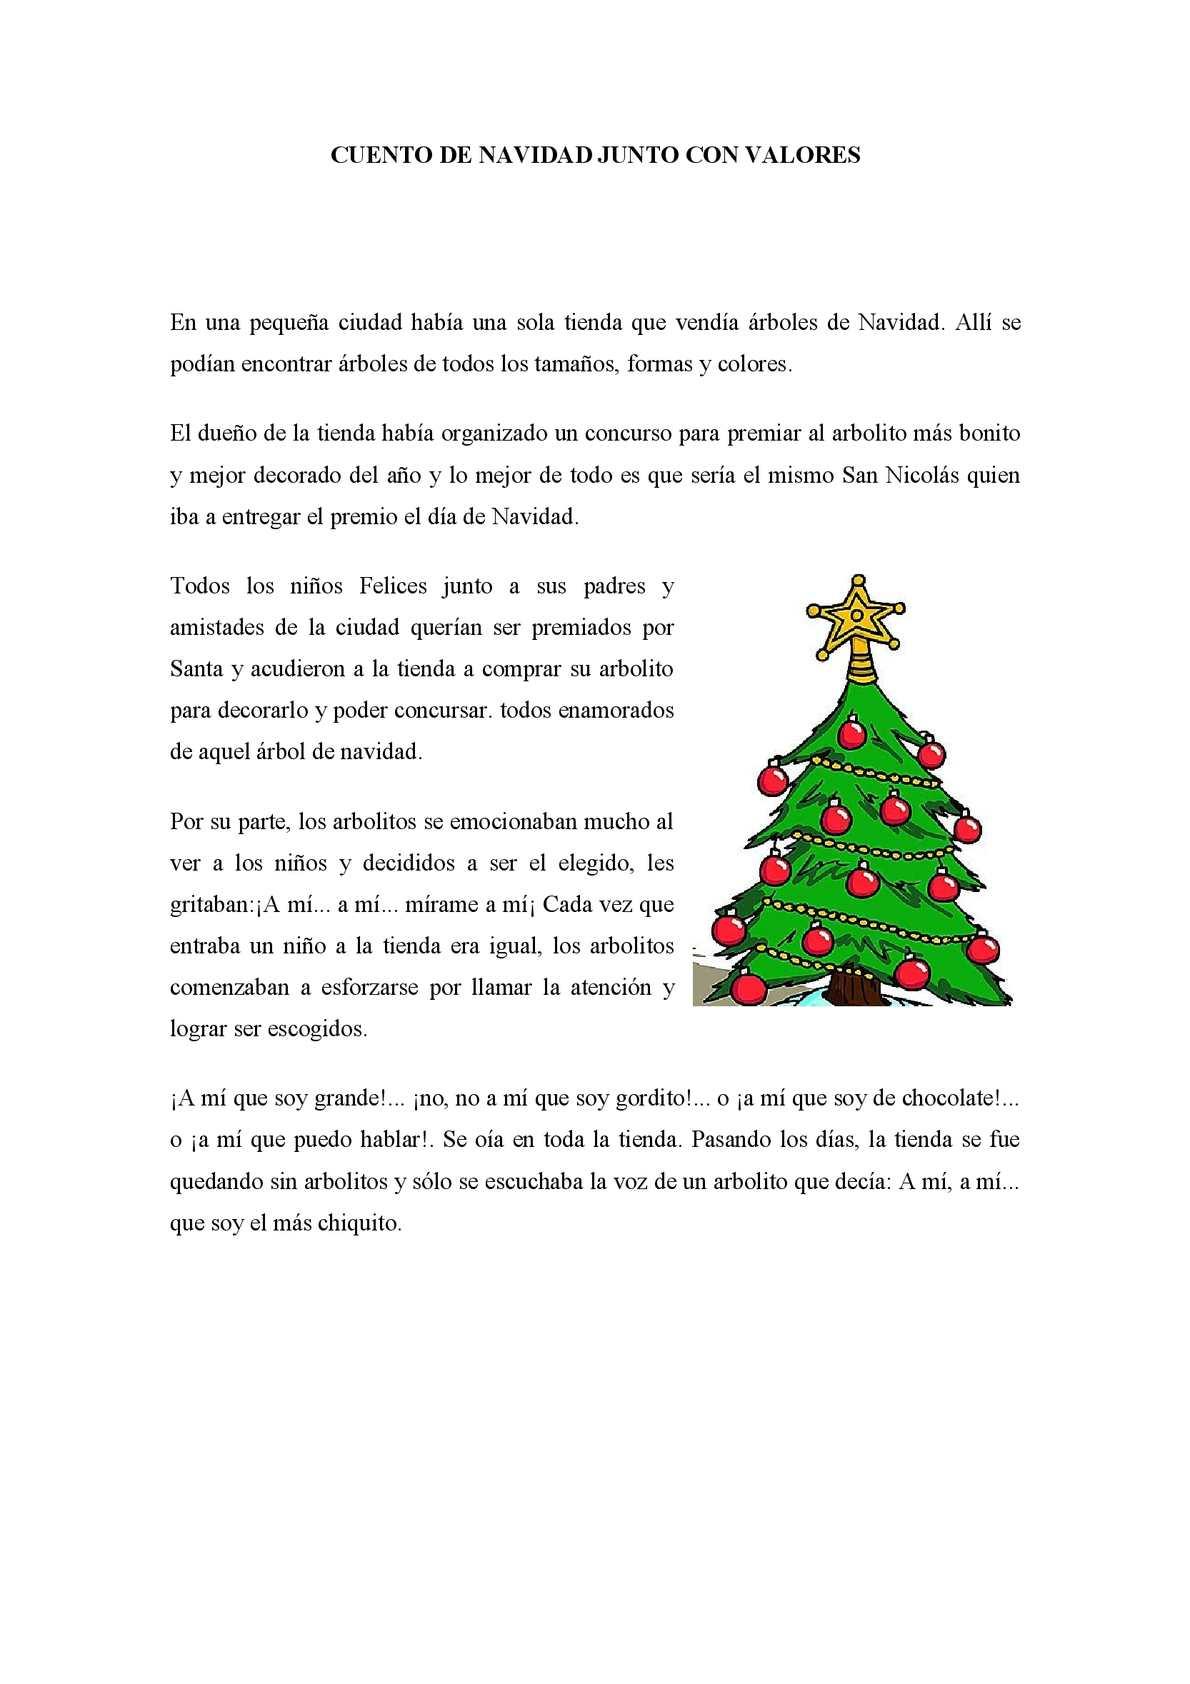 97e4c4d1372 Calaméo - CUENTO DE NAVIDAD JUNTO CON VALORES